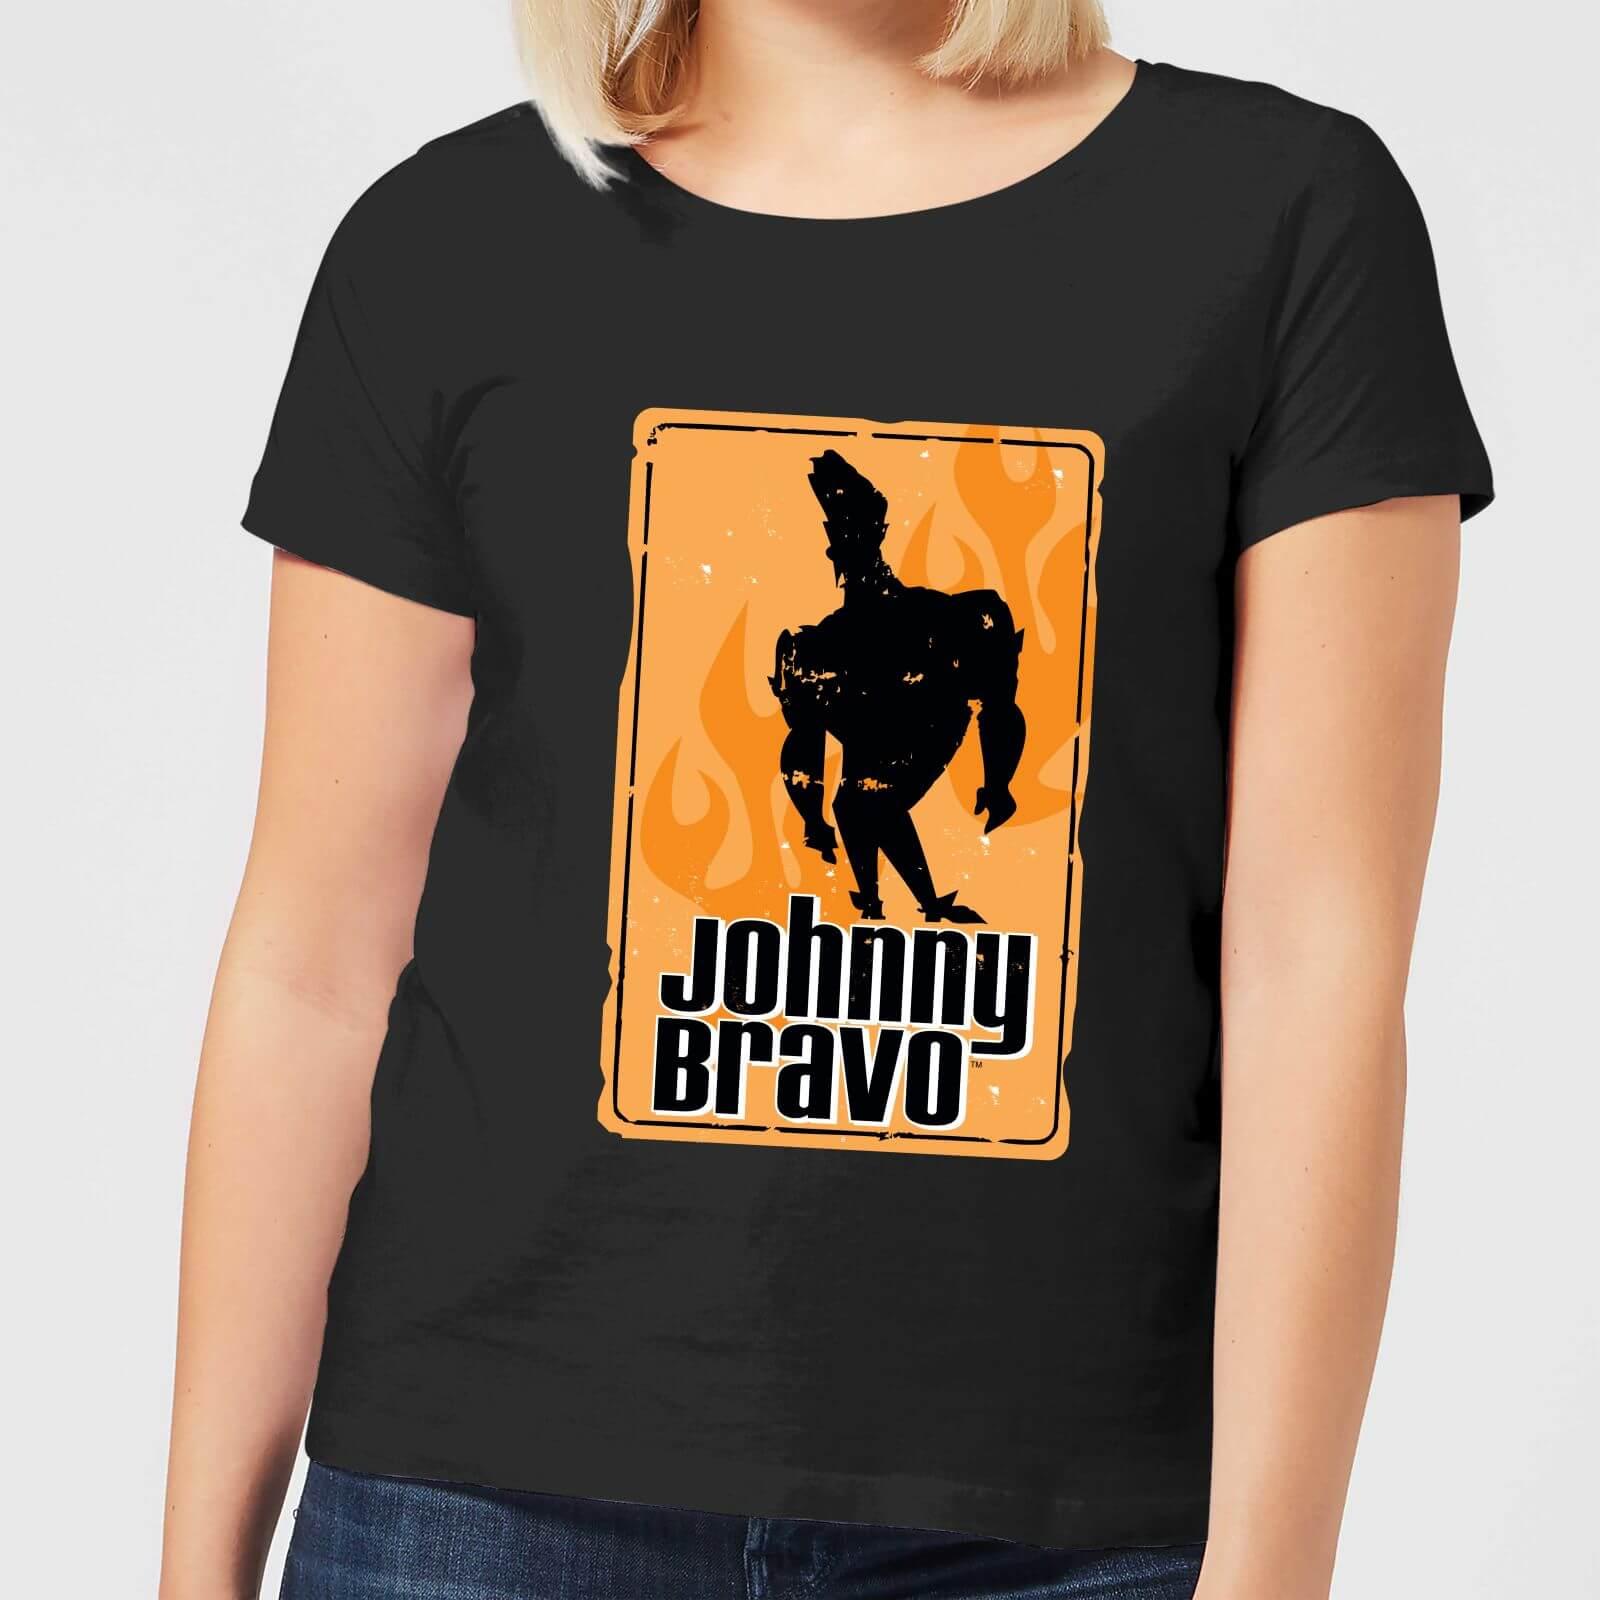 Cartoon Network Johnny Bravo Fire Women's T-Shirt - Black - S - Black